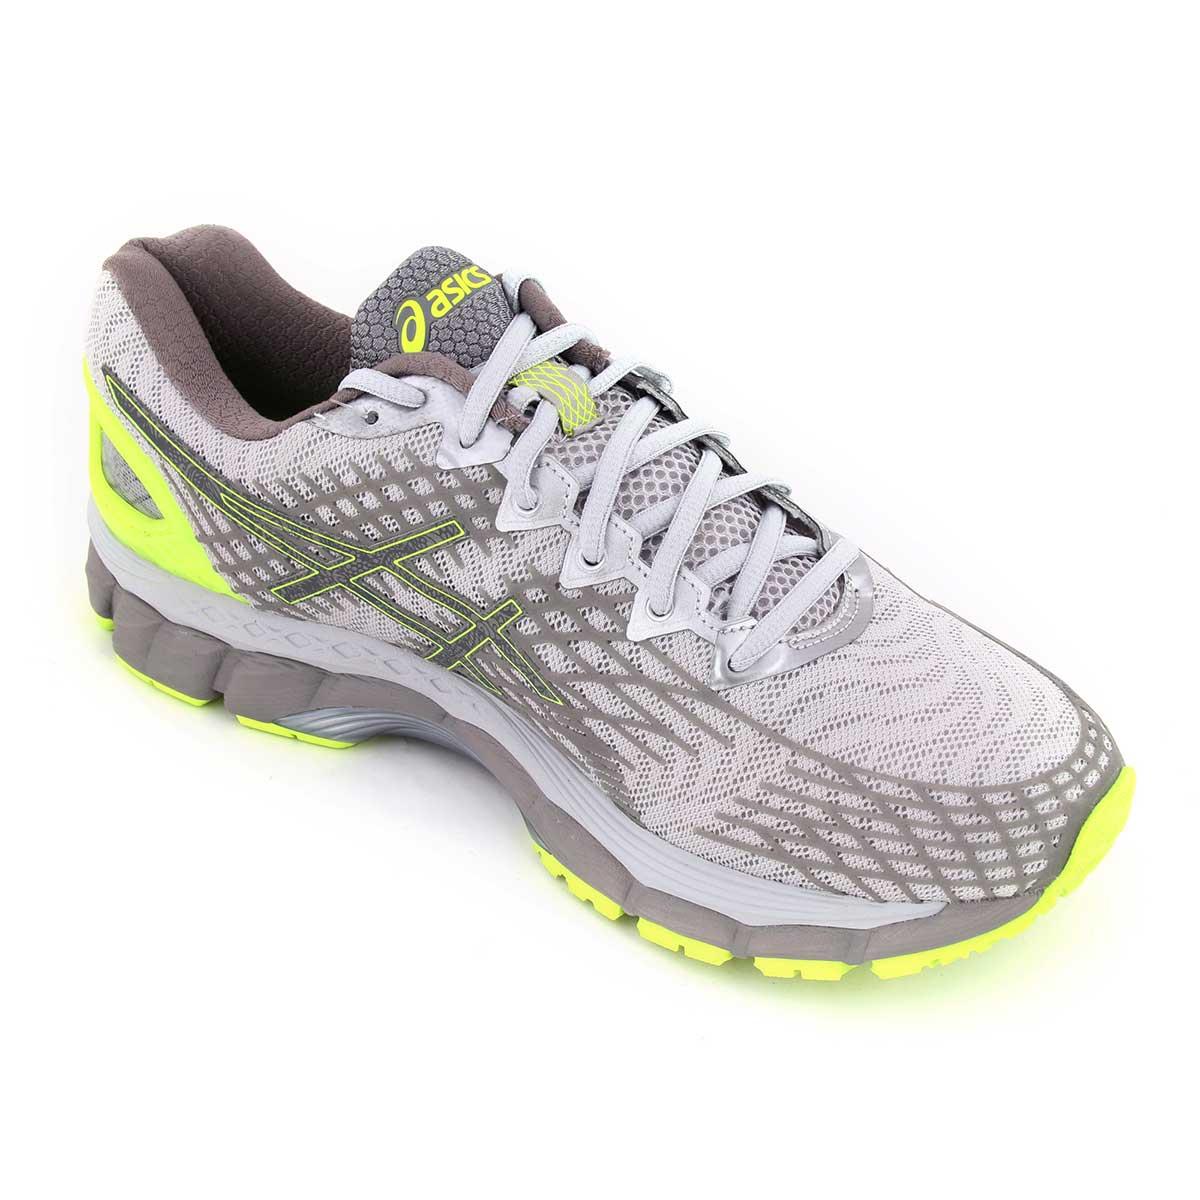 premium selection 2d6ce 7804c Asics Gel-Nimbus 17 Lite Show Running Shoes (Yellow/Silver/Black)